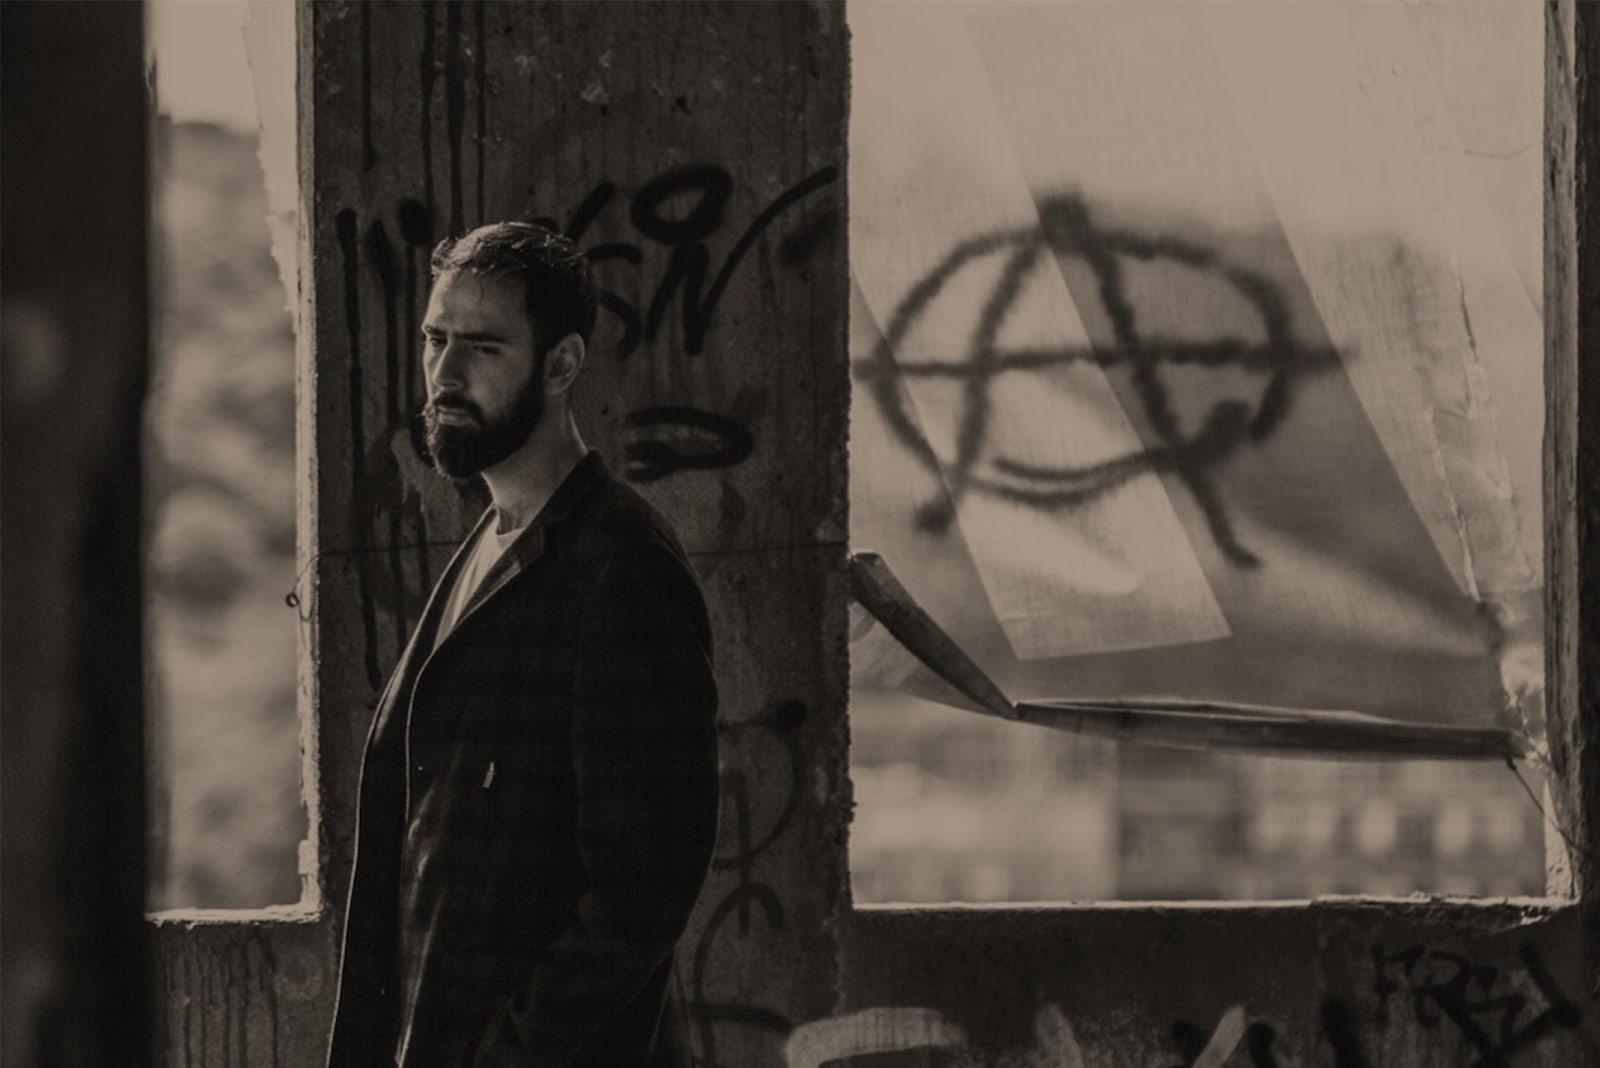 sad man with beard standing near wall